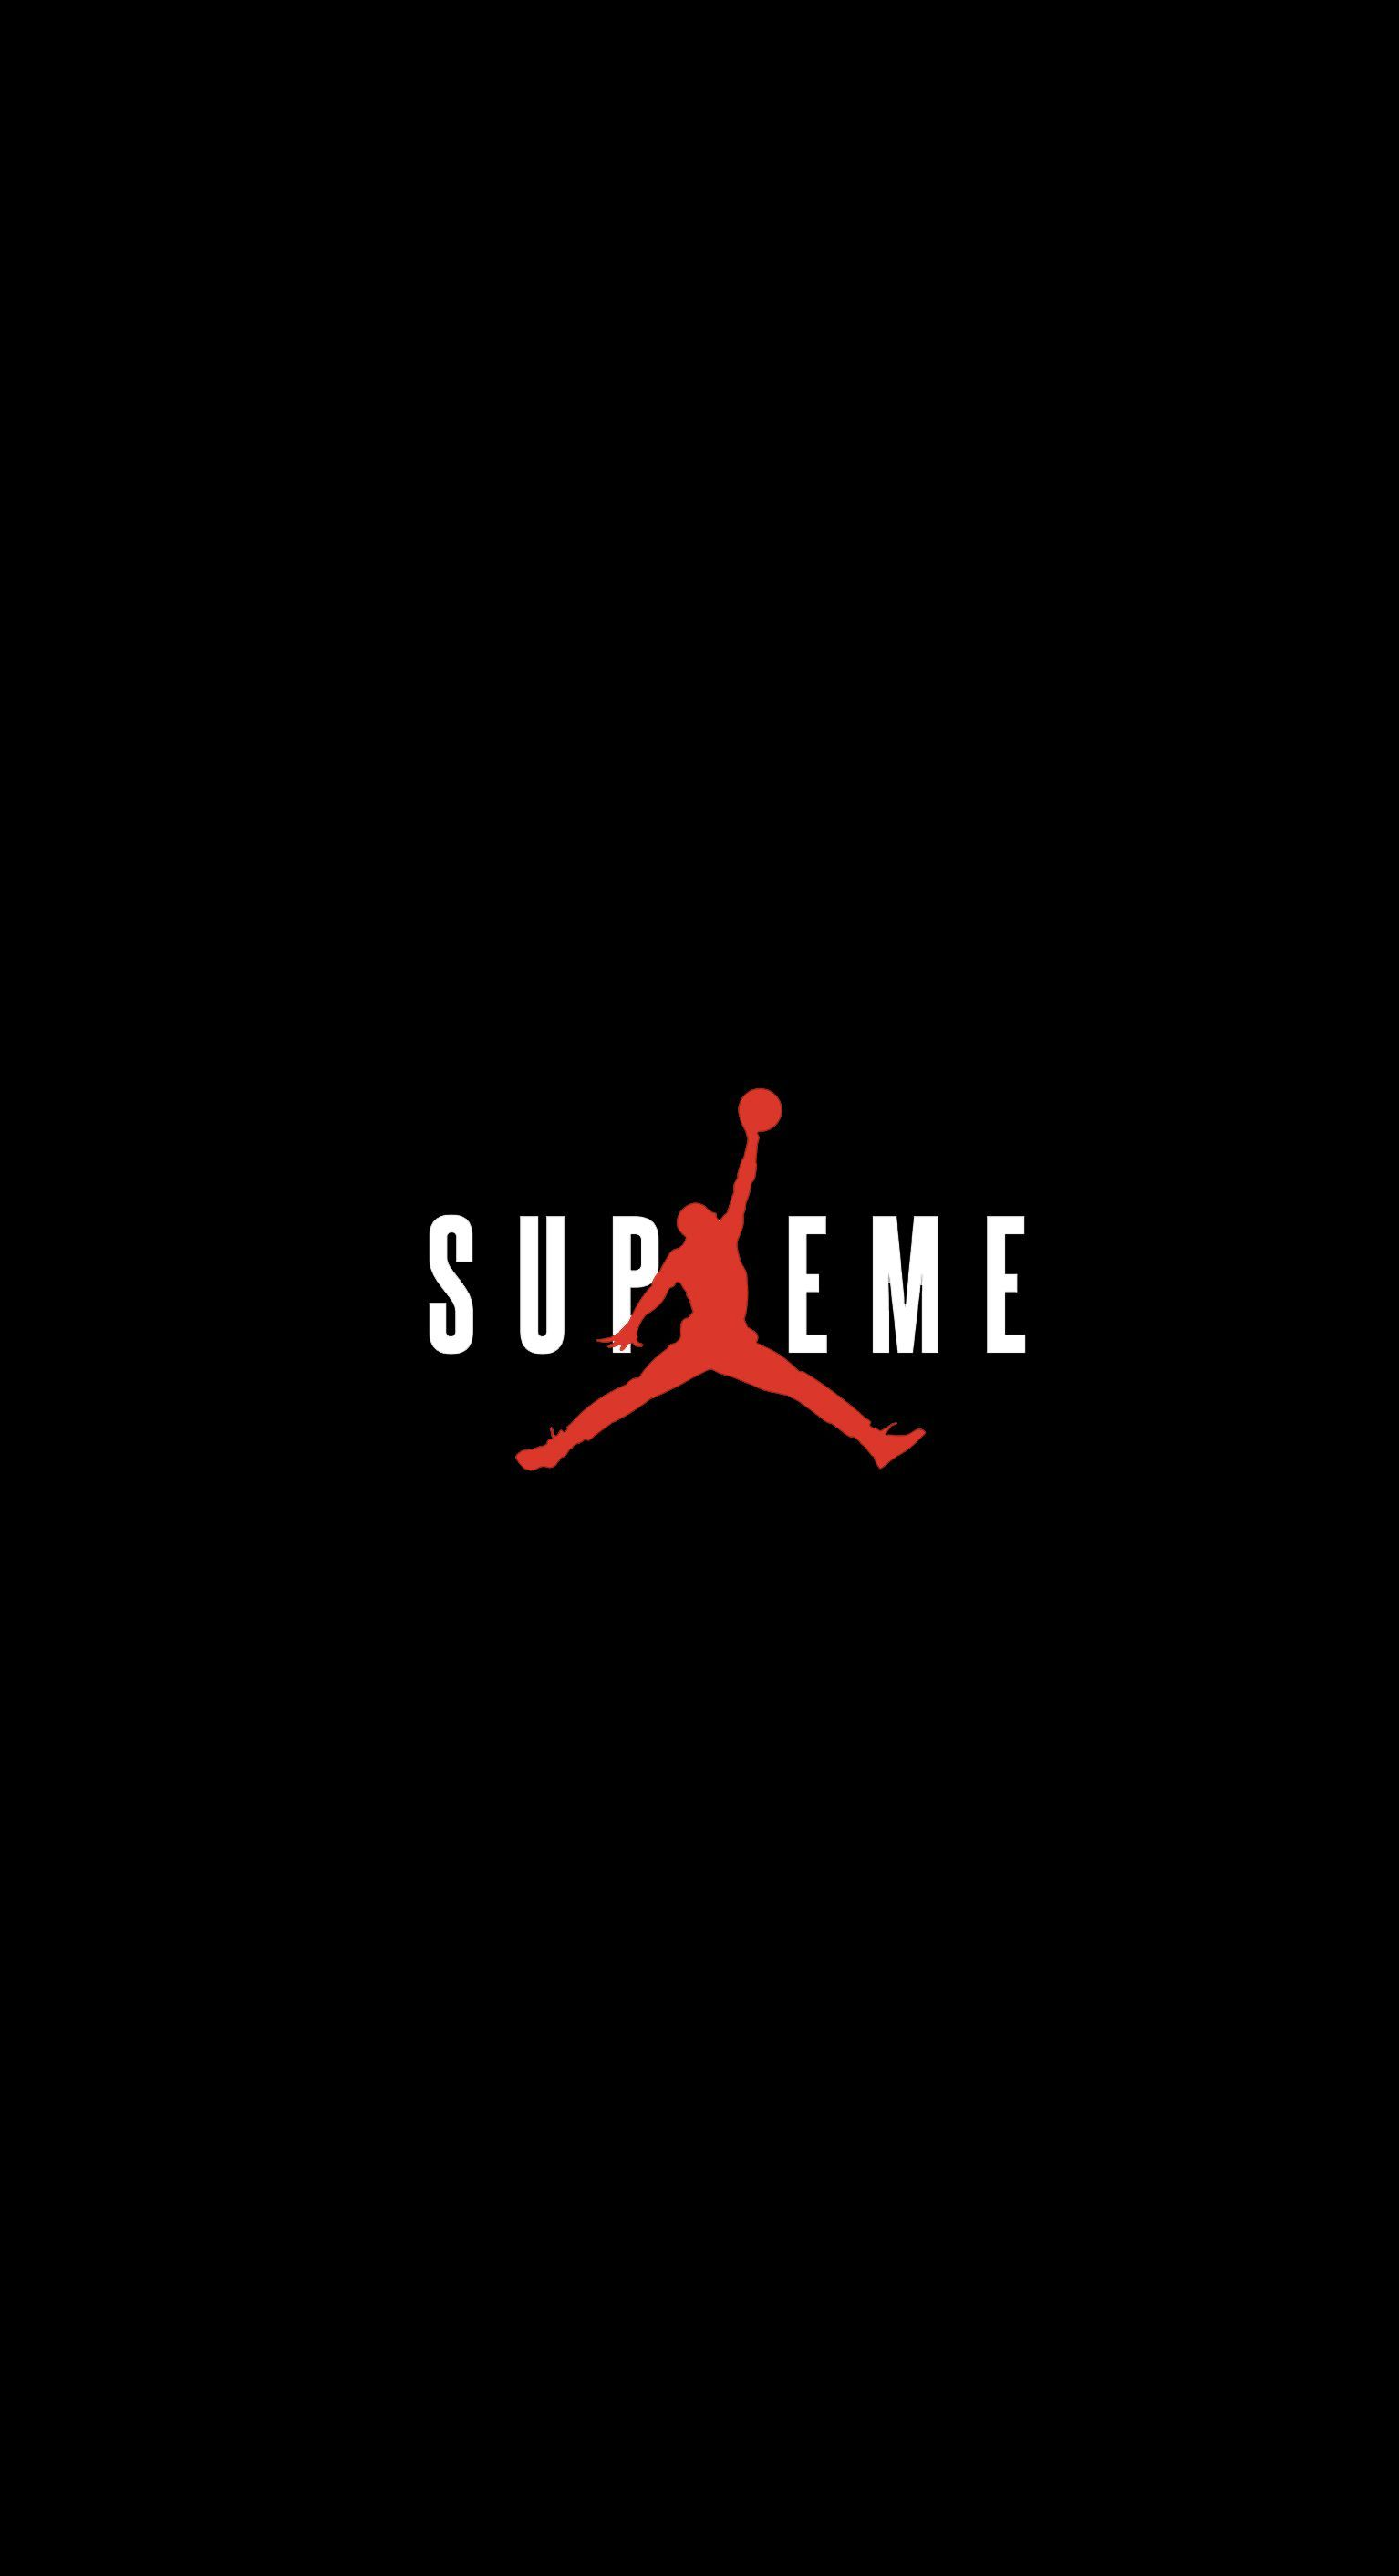 Supreme x Jordan Wallpaper streetwear   Streetwear Wallpapers 1534x2824